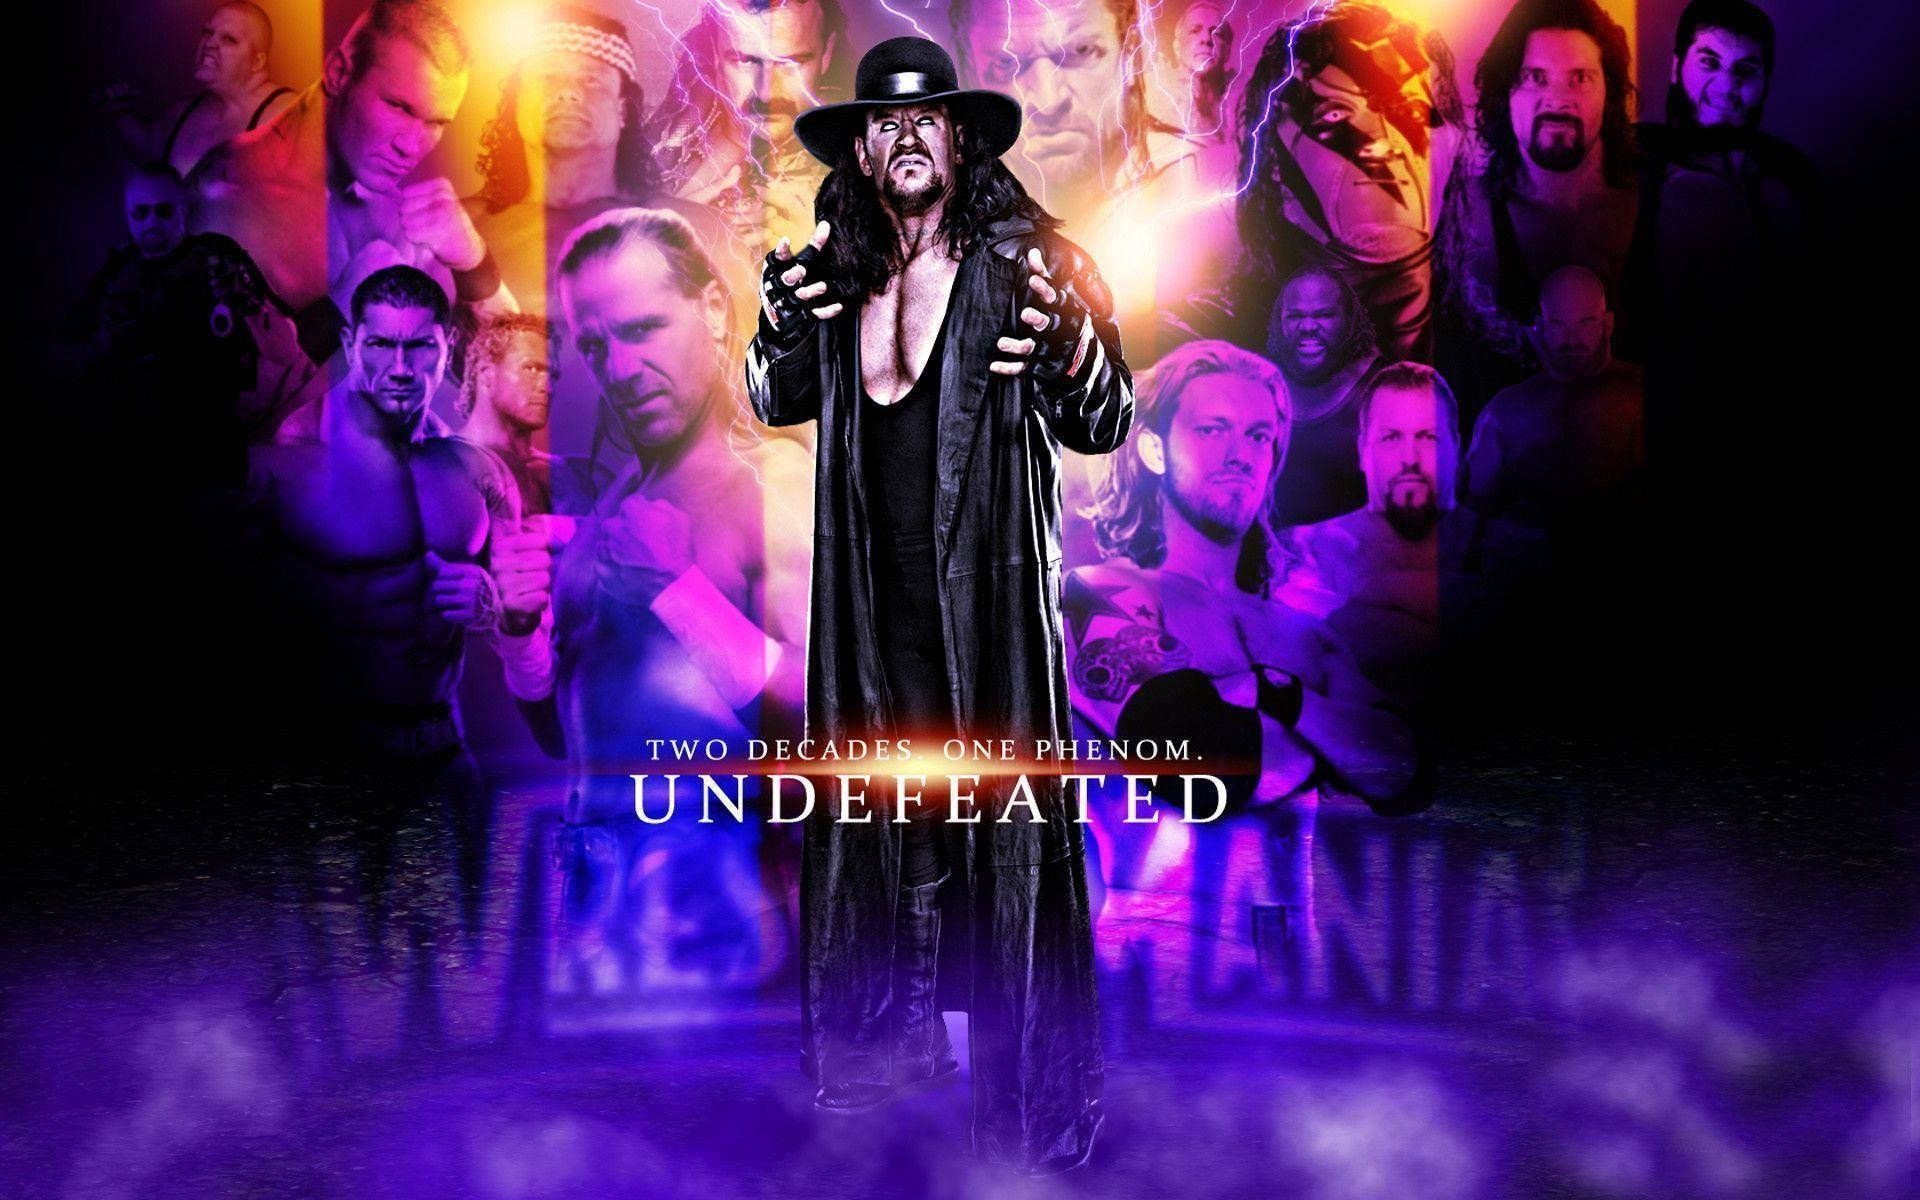 Undertaker Wallpaper 2018 HD (61+ Images